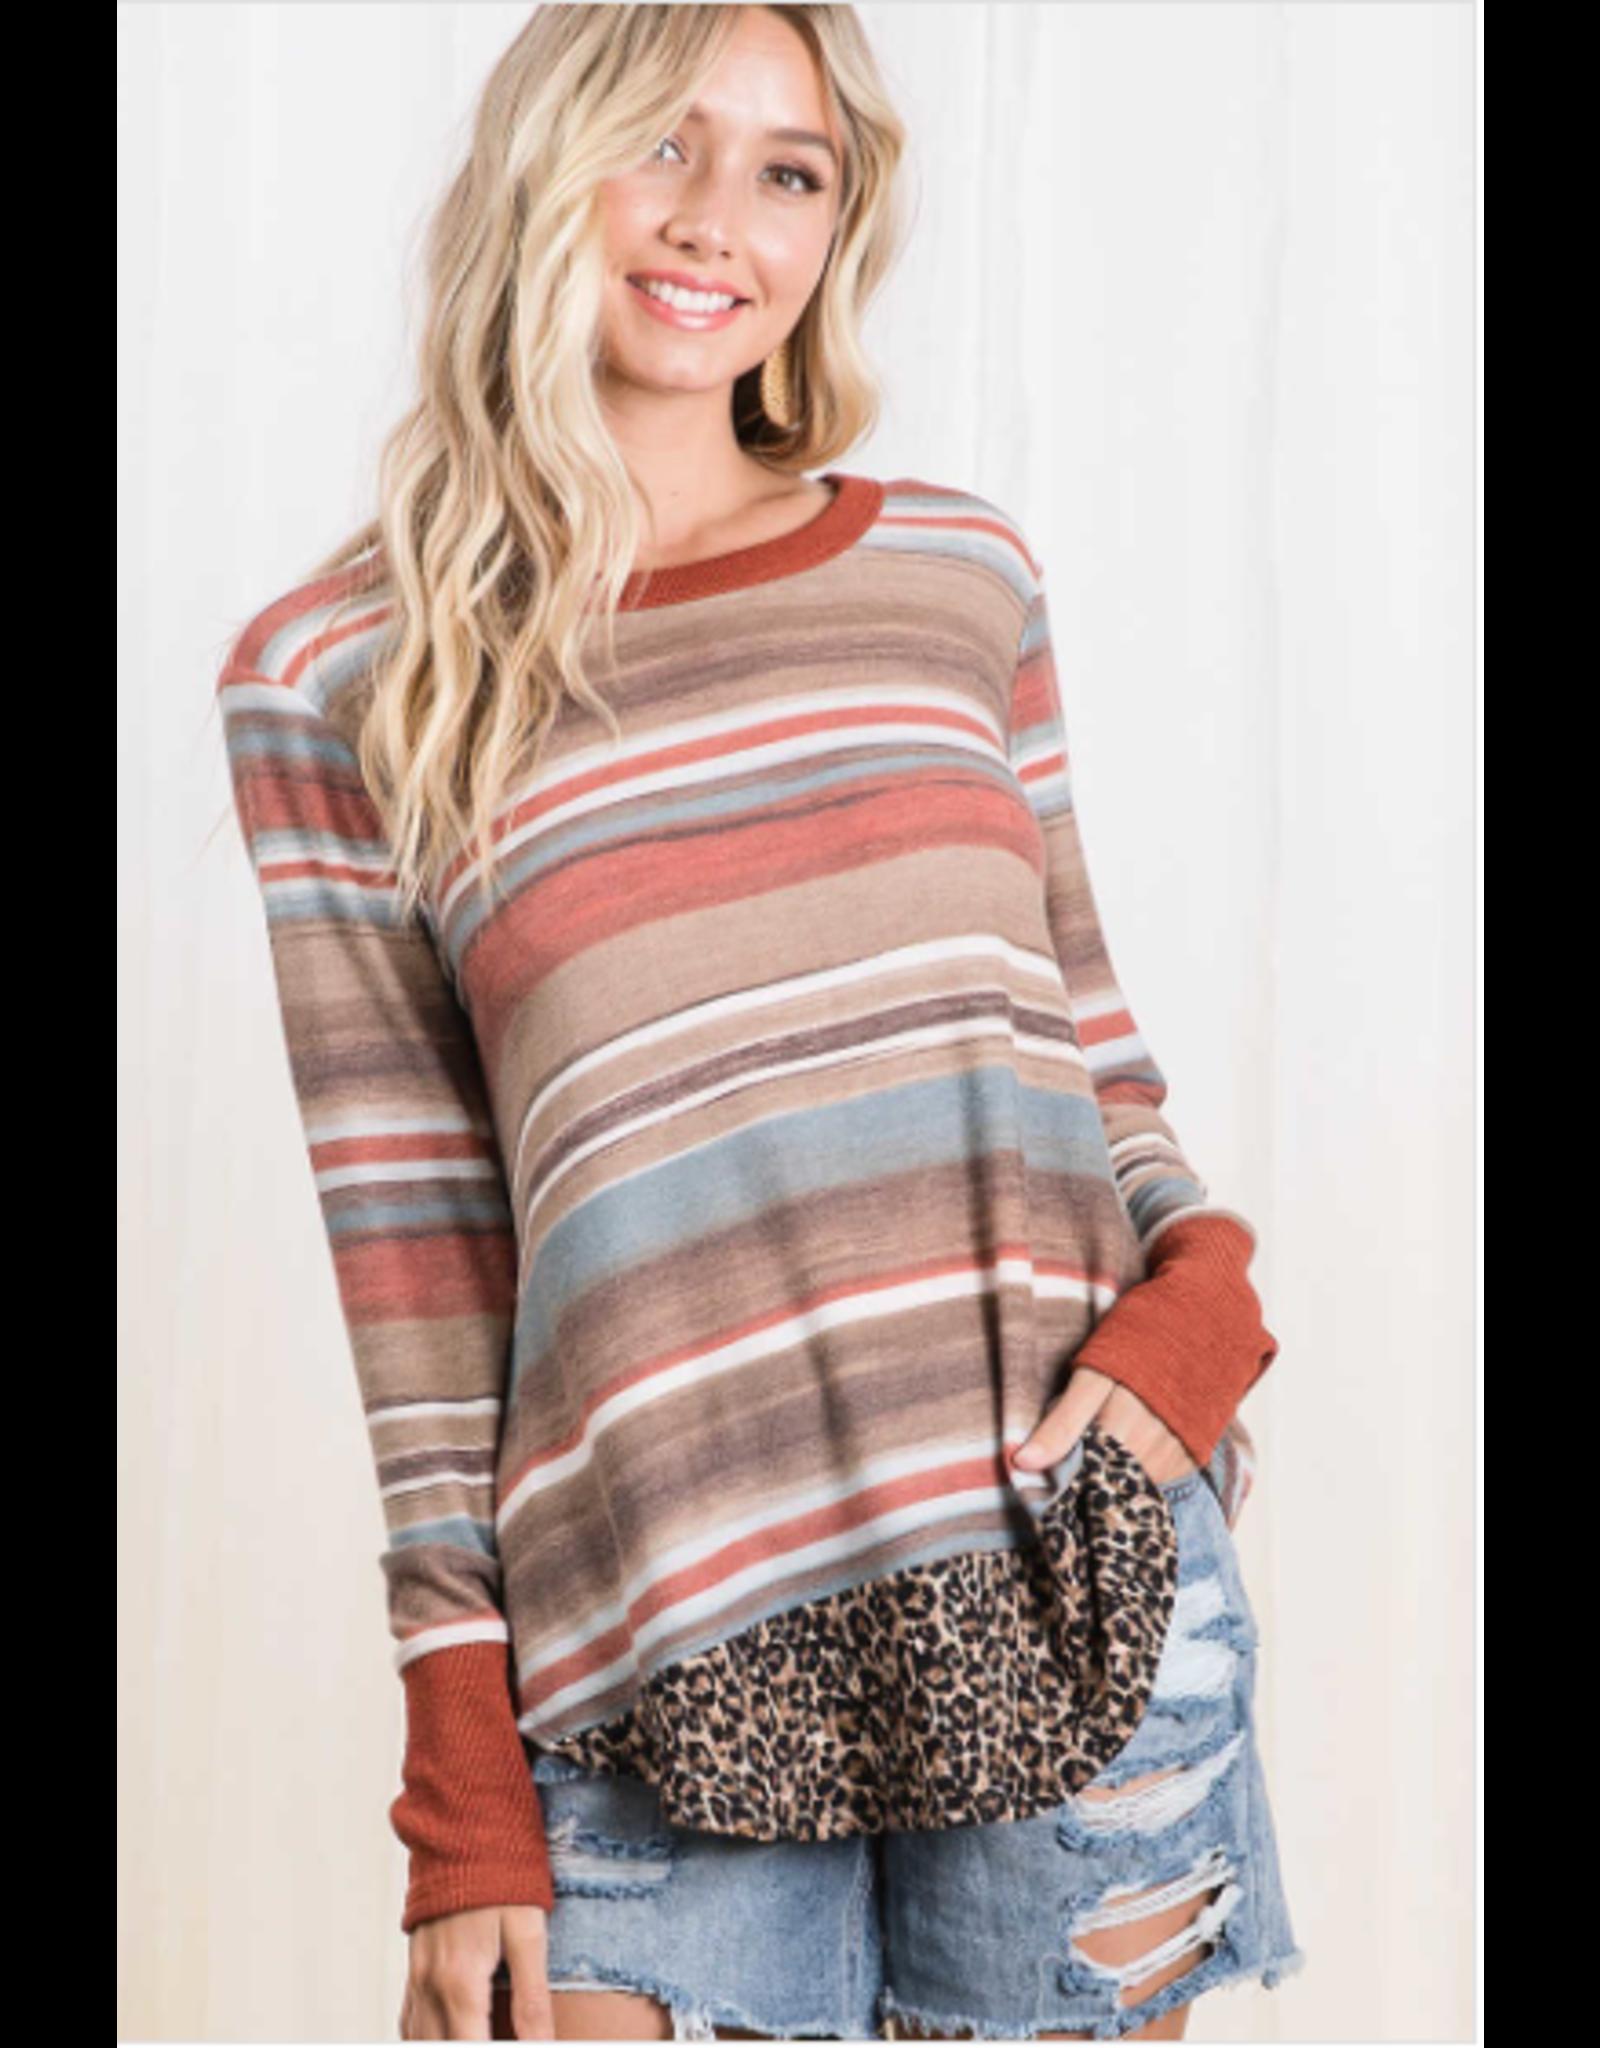 Aubrey - Striped top with animal print hem